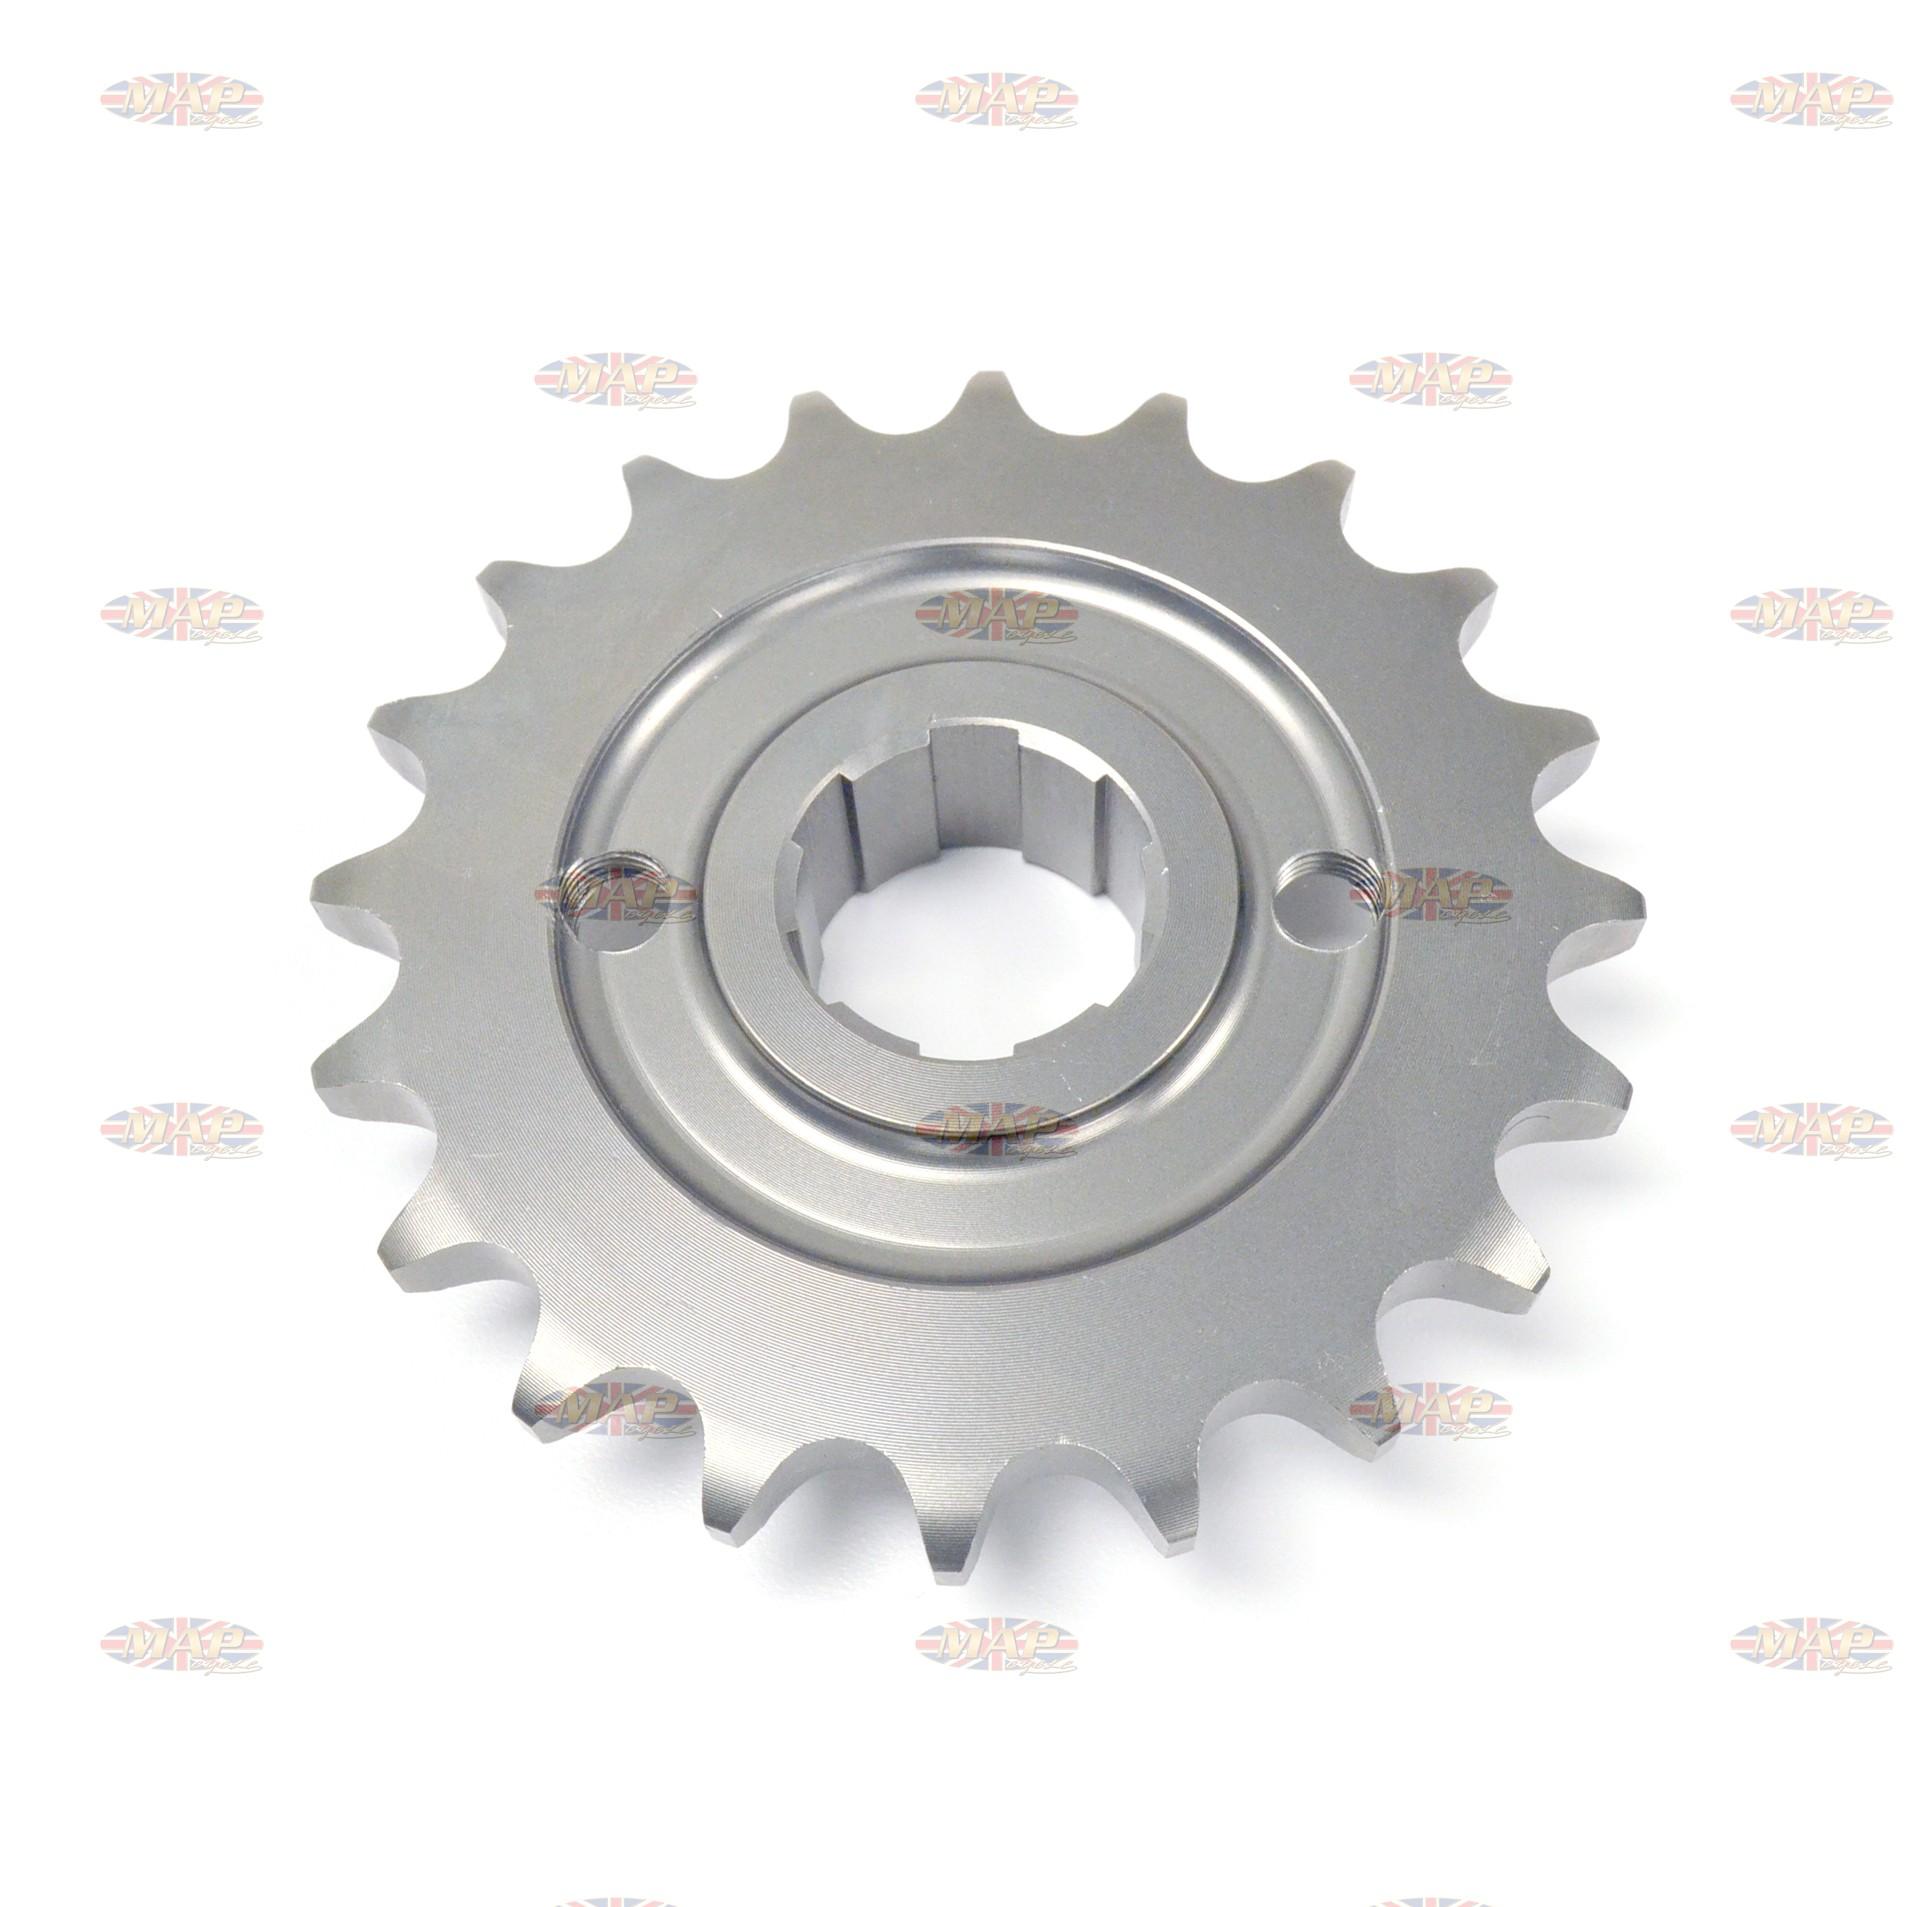 Triumph 500cc, 20-Tooth, Countershaft Sprocket  57-1476/20/E